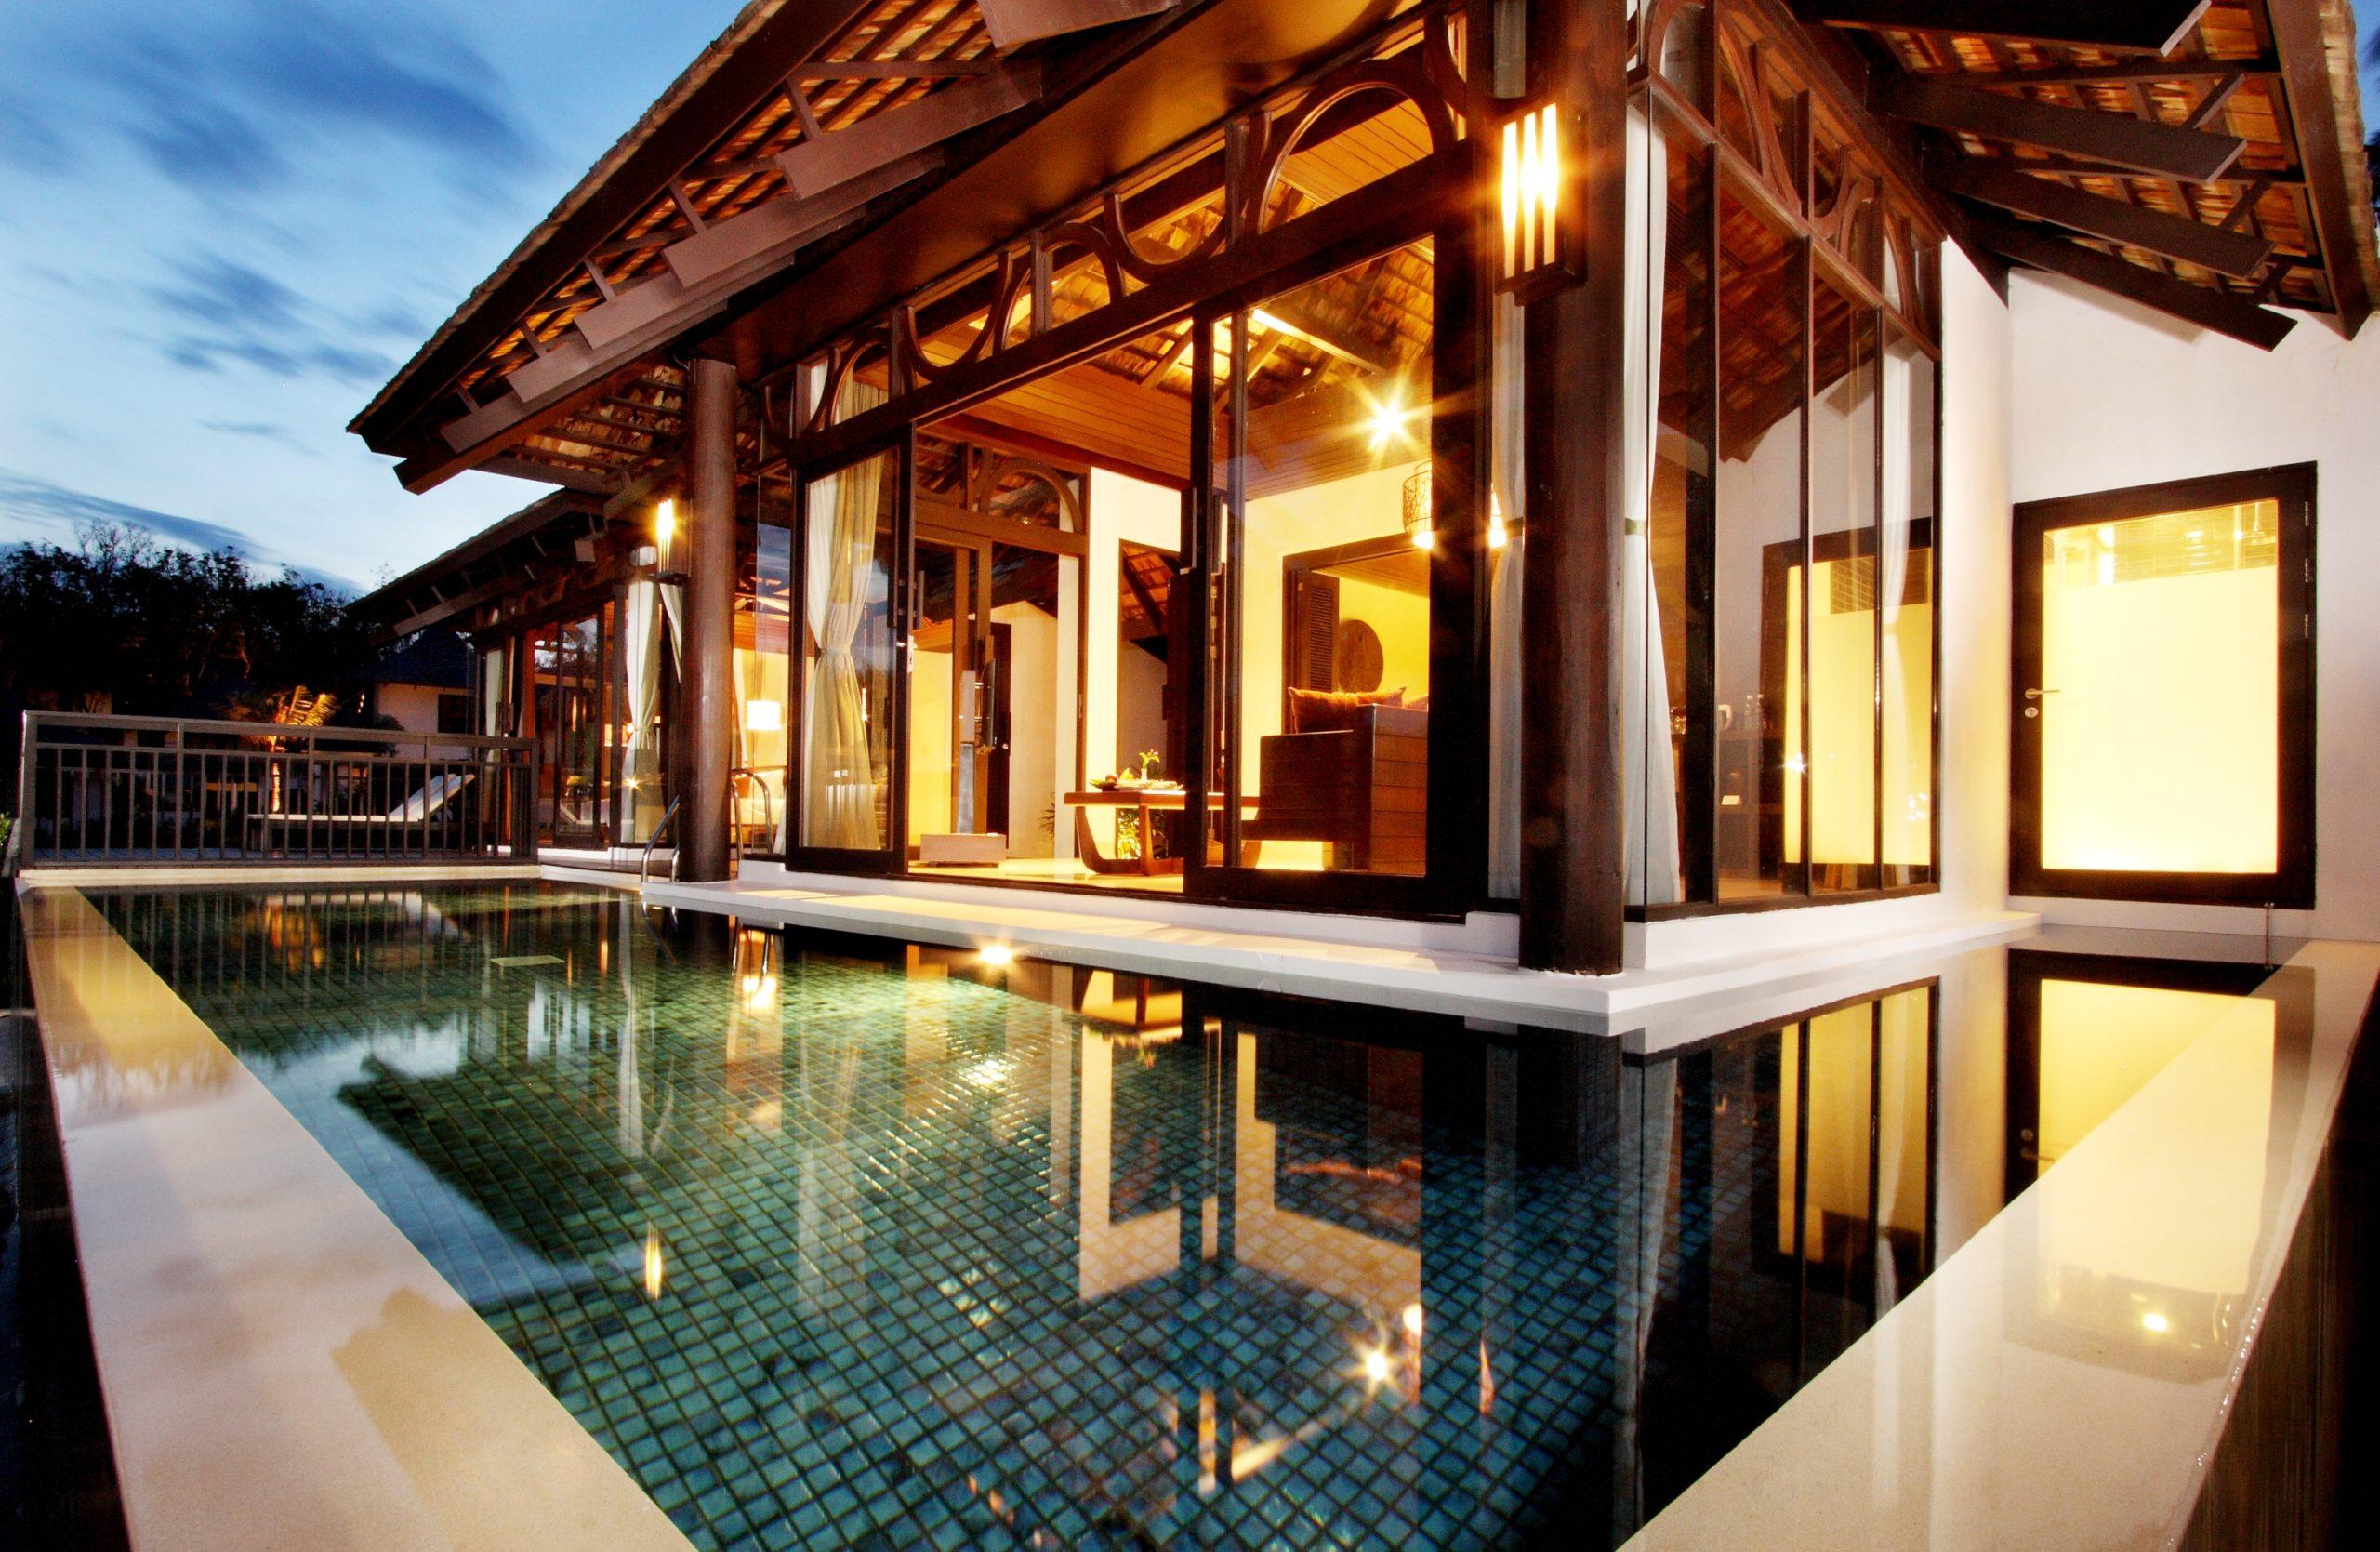 018_Two-Bedroom Pool Villa_Terrace The Vijitt Resort Phuket